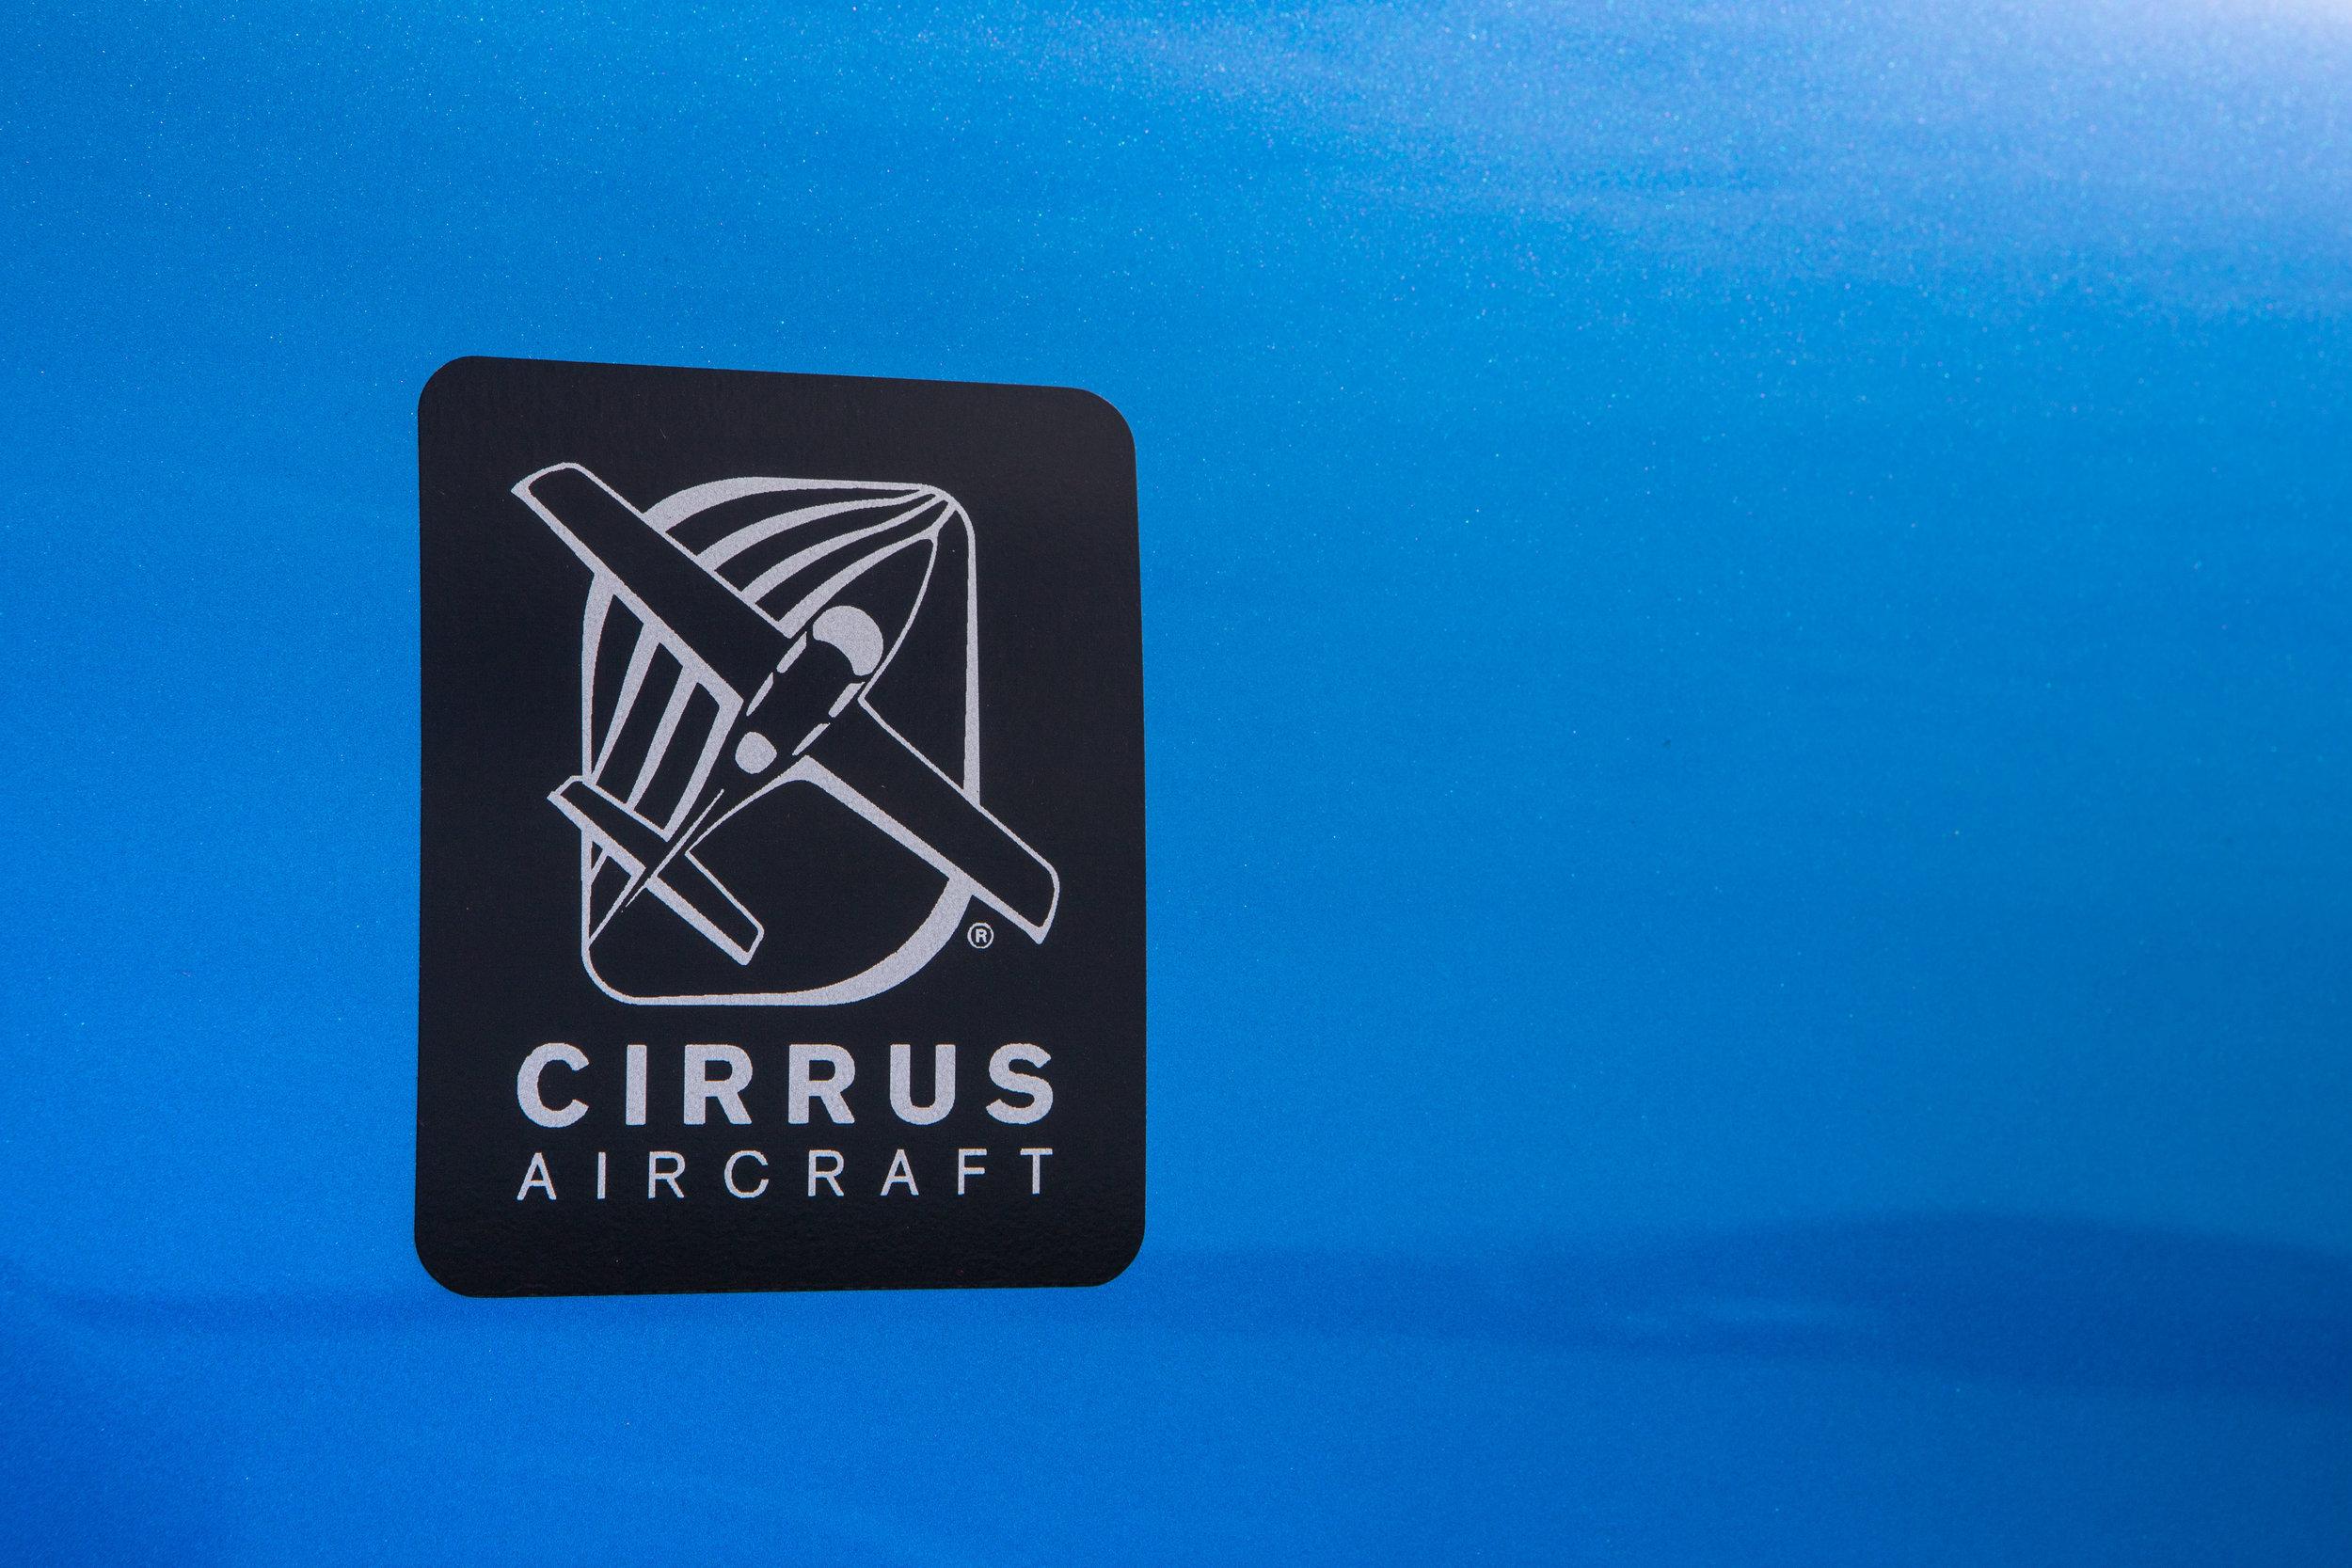 Cirrus-47.jpg